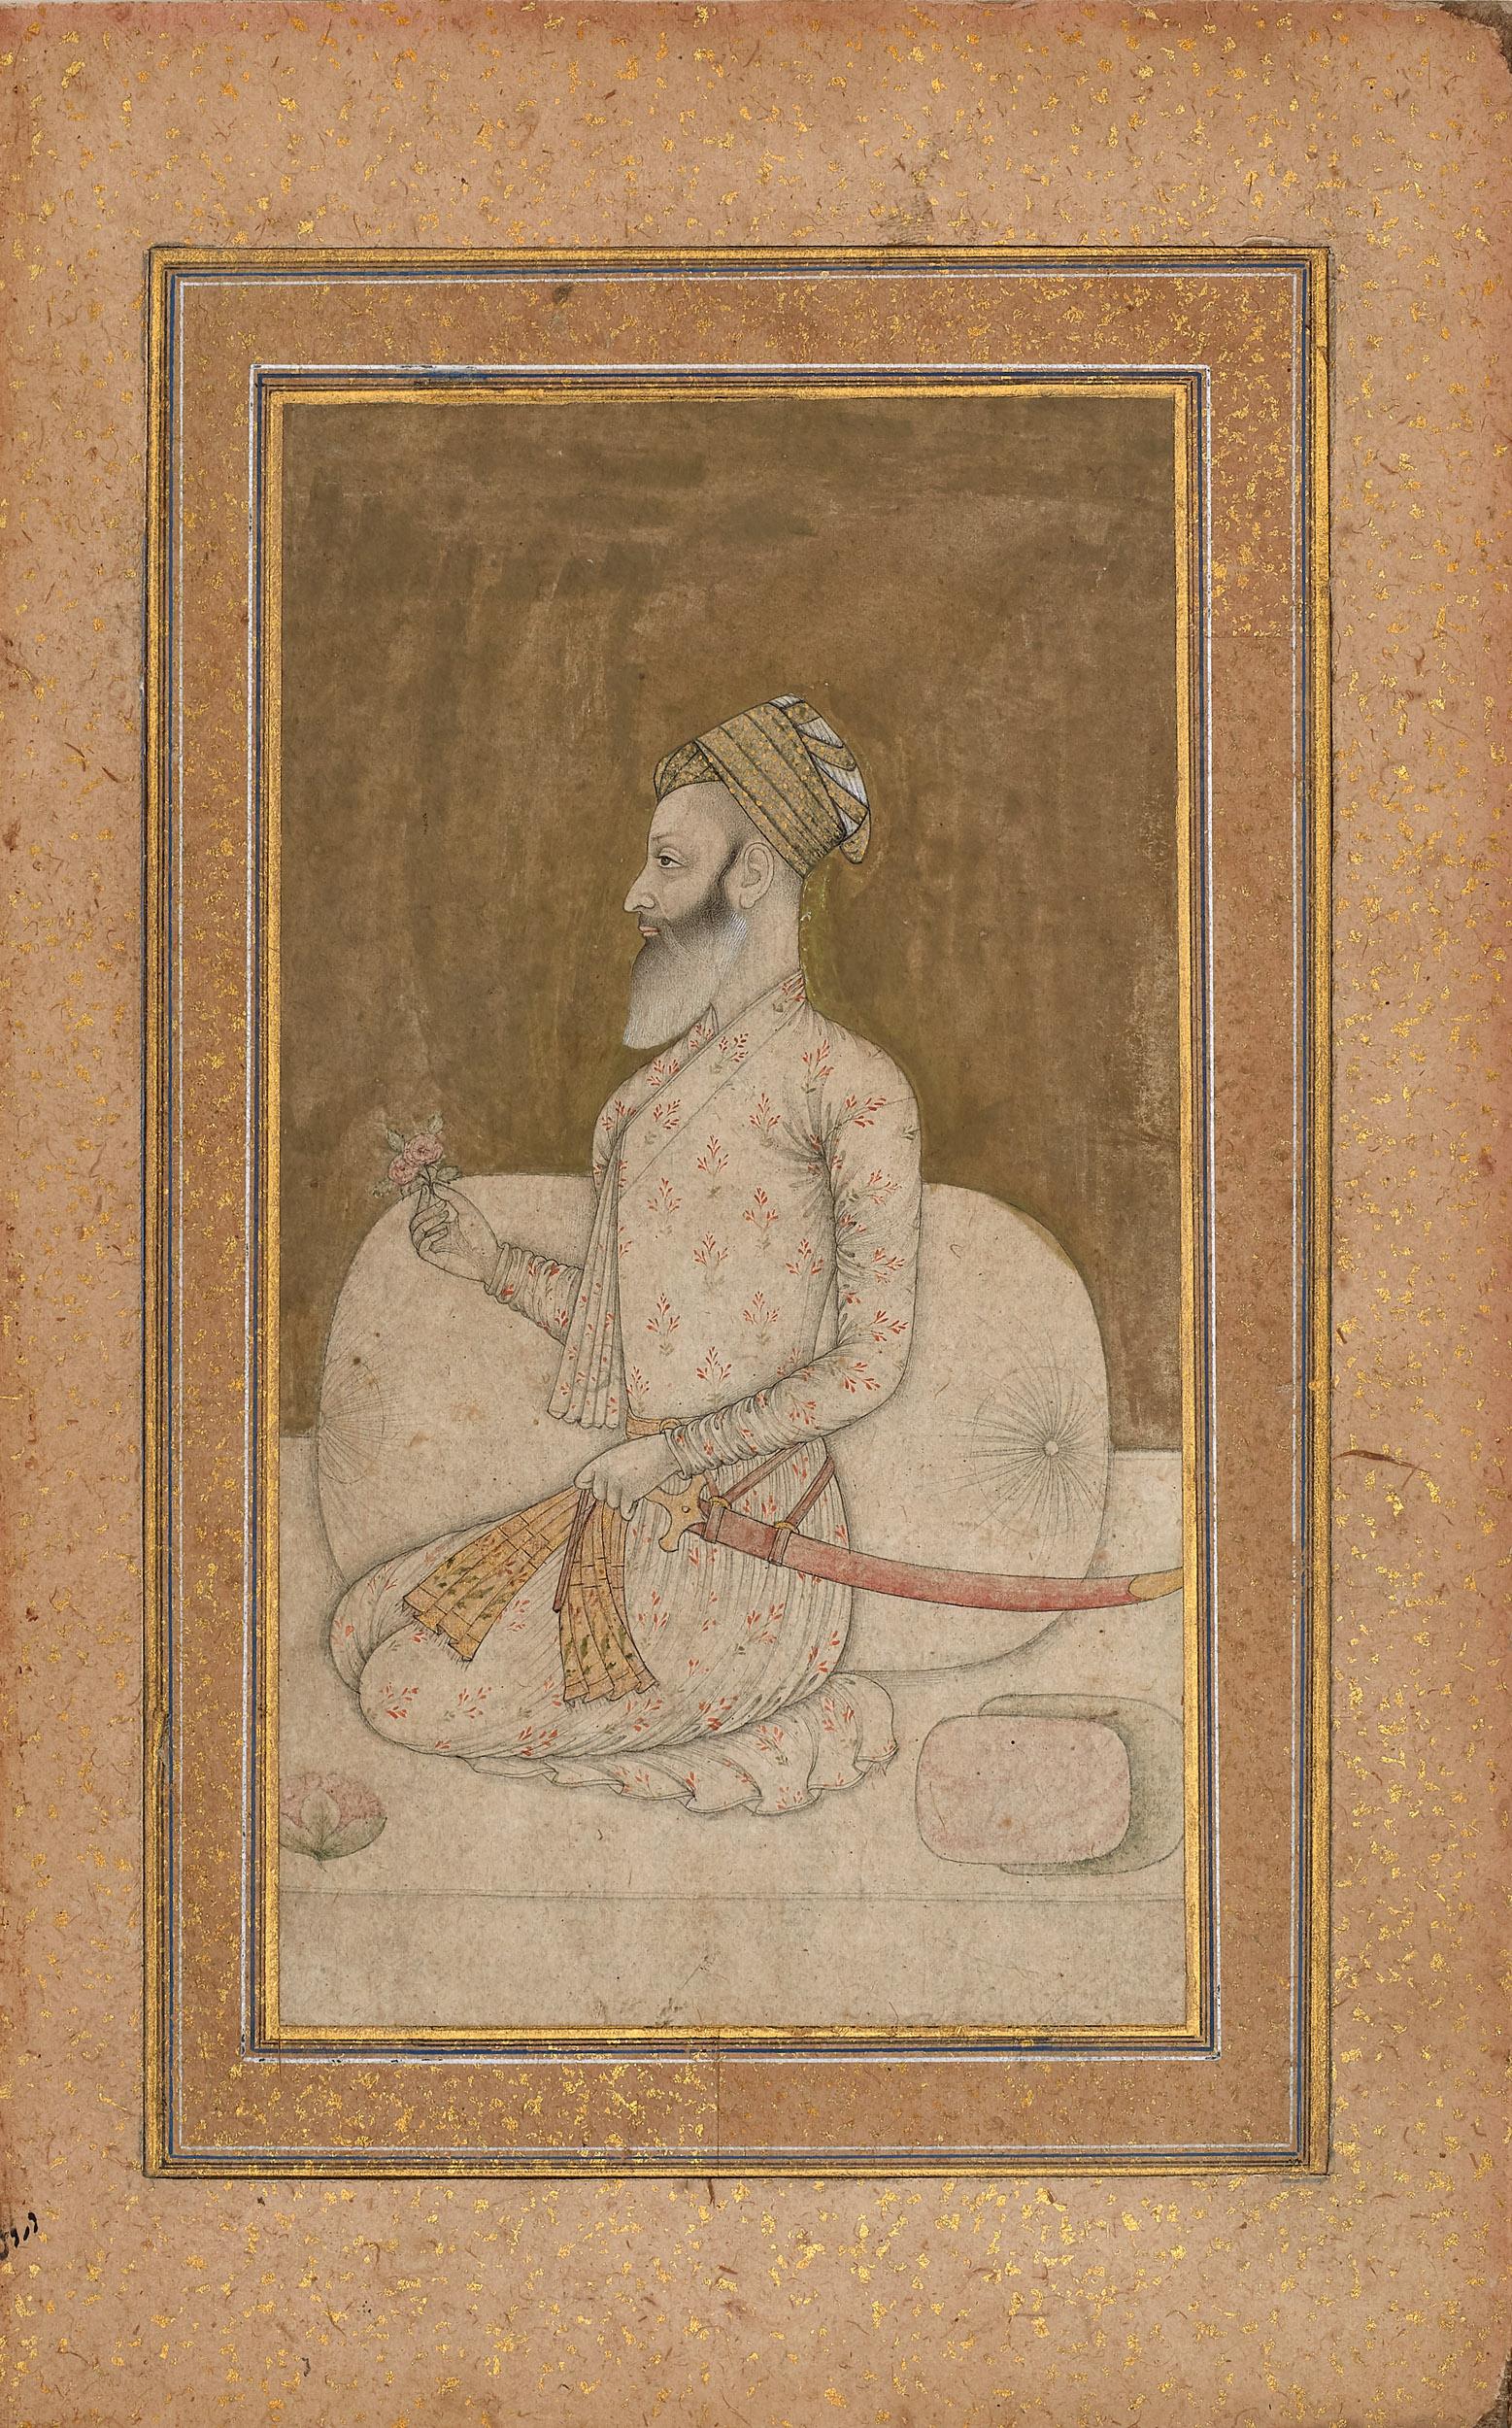 Portrait of a Bearded Nobleman